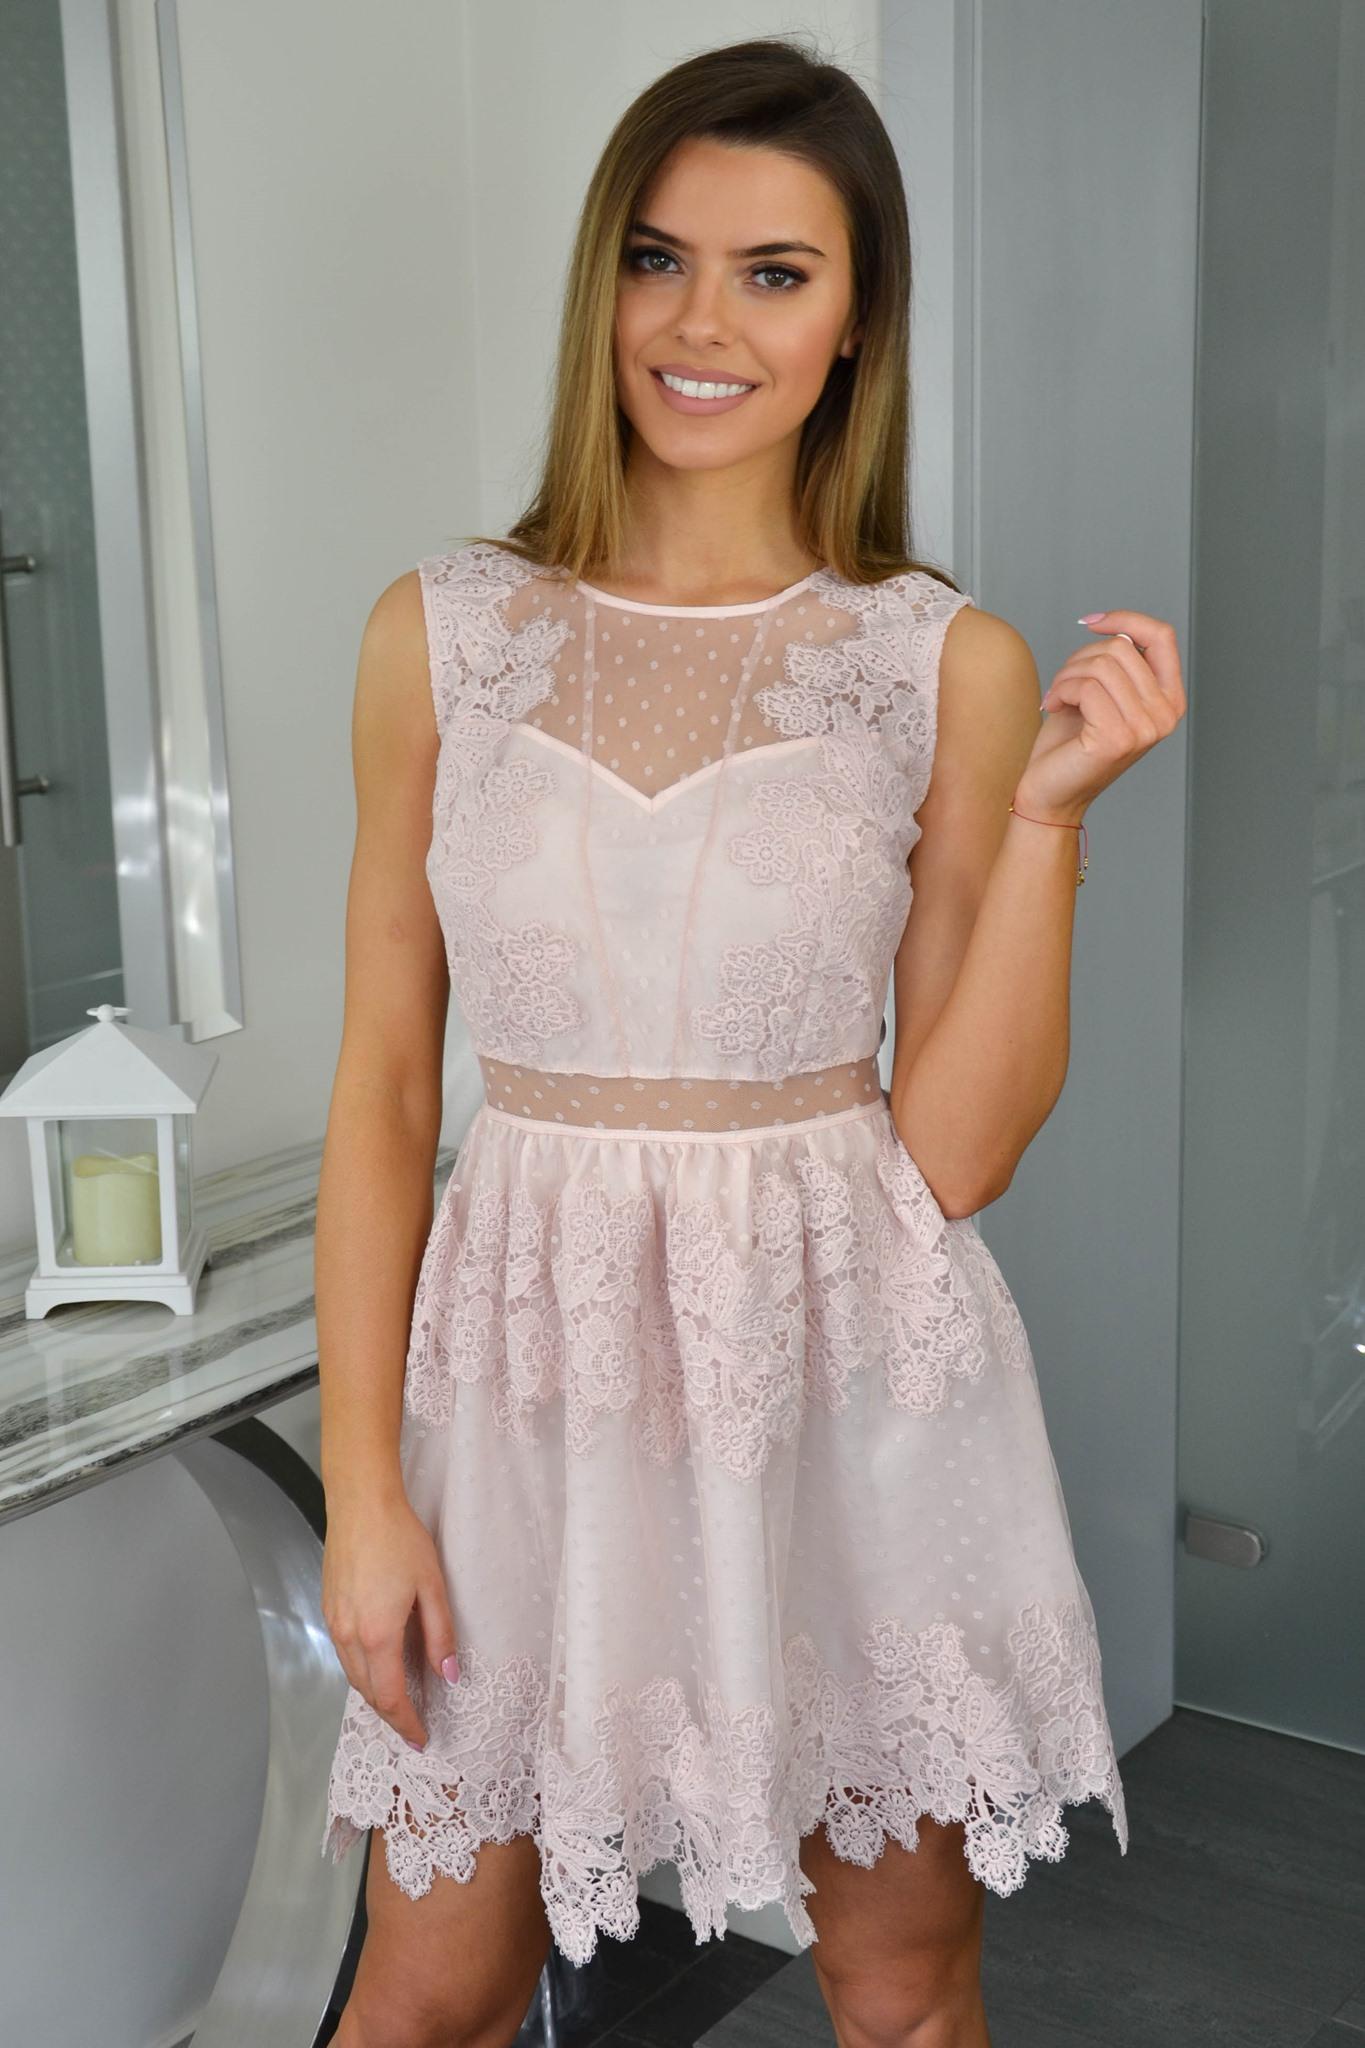 b5f00f99dc Dámske čipkované šaty 7456 ružové - Tentation.sk